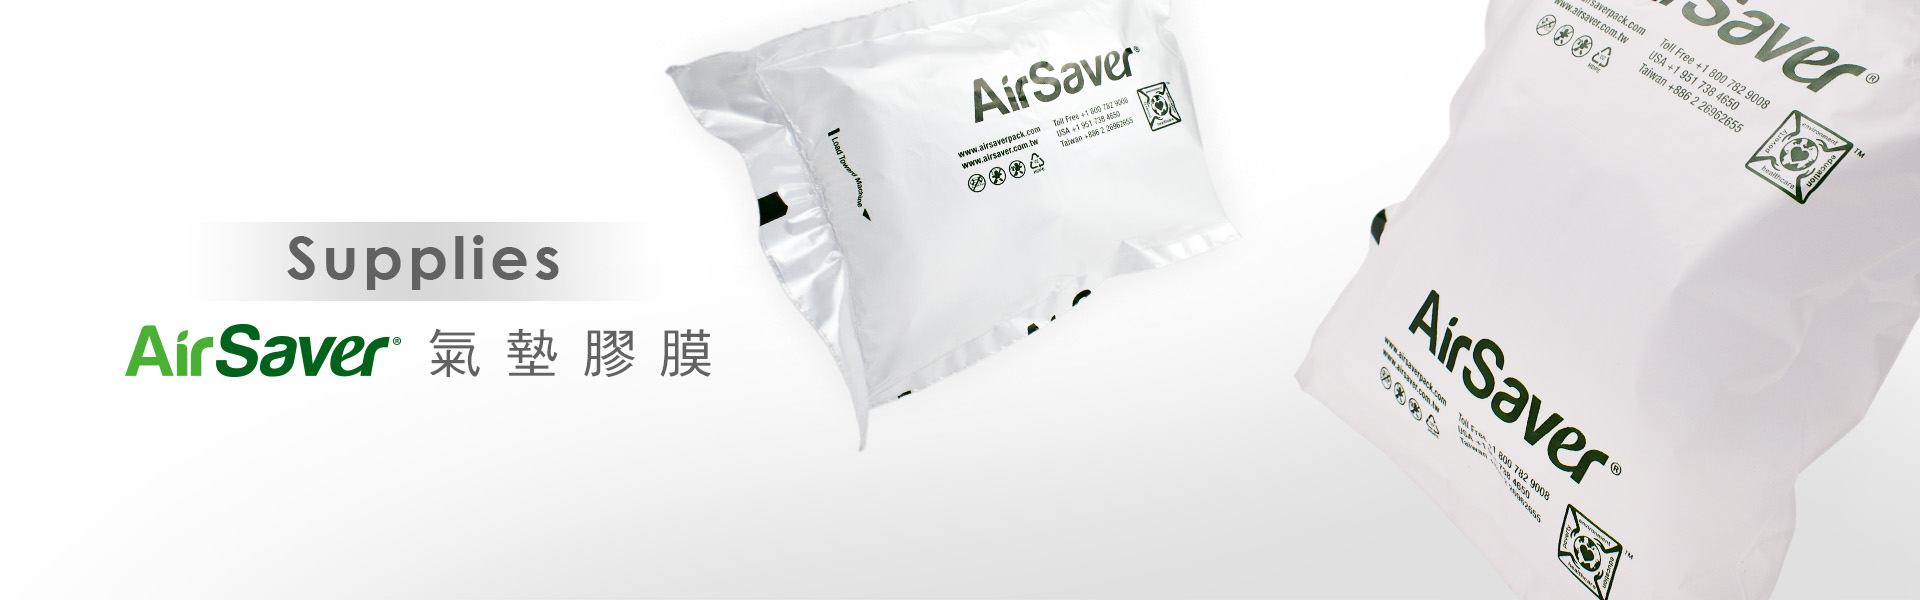 AirSaver氣泡布、氣泡袋